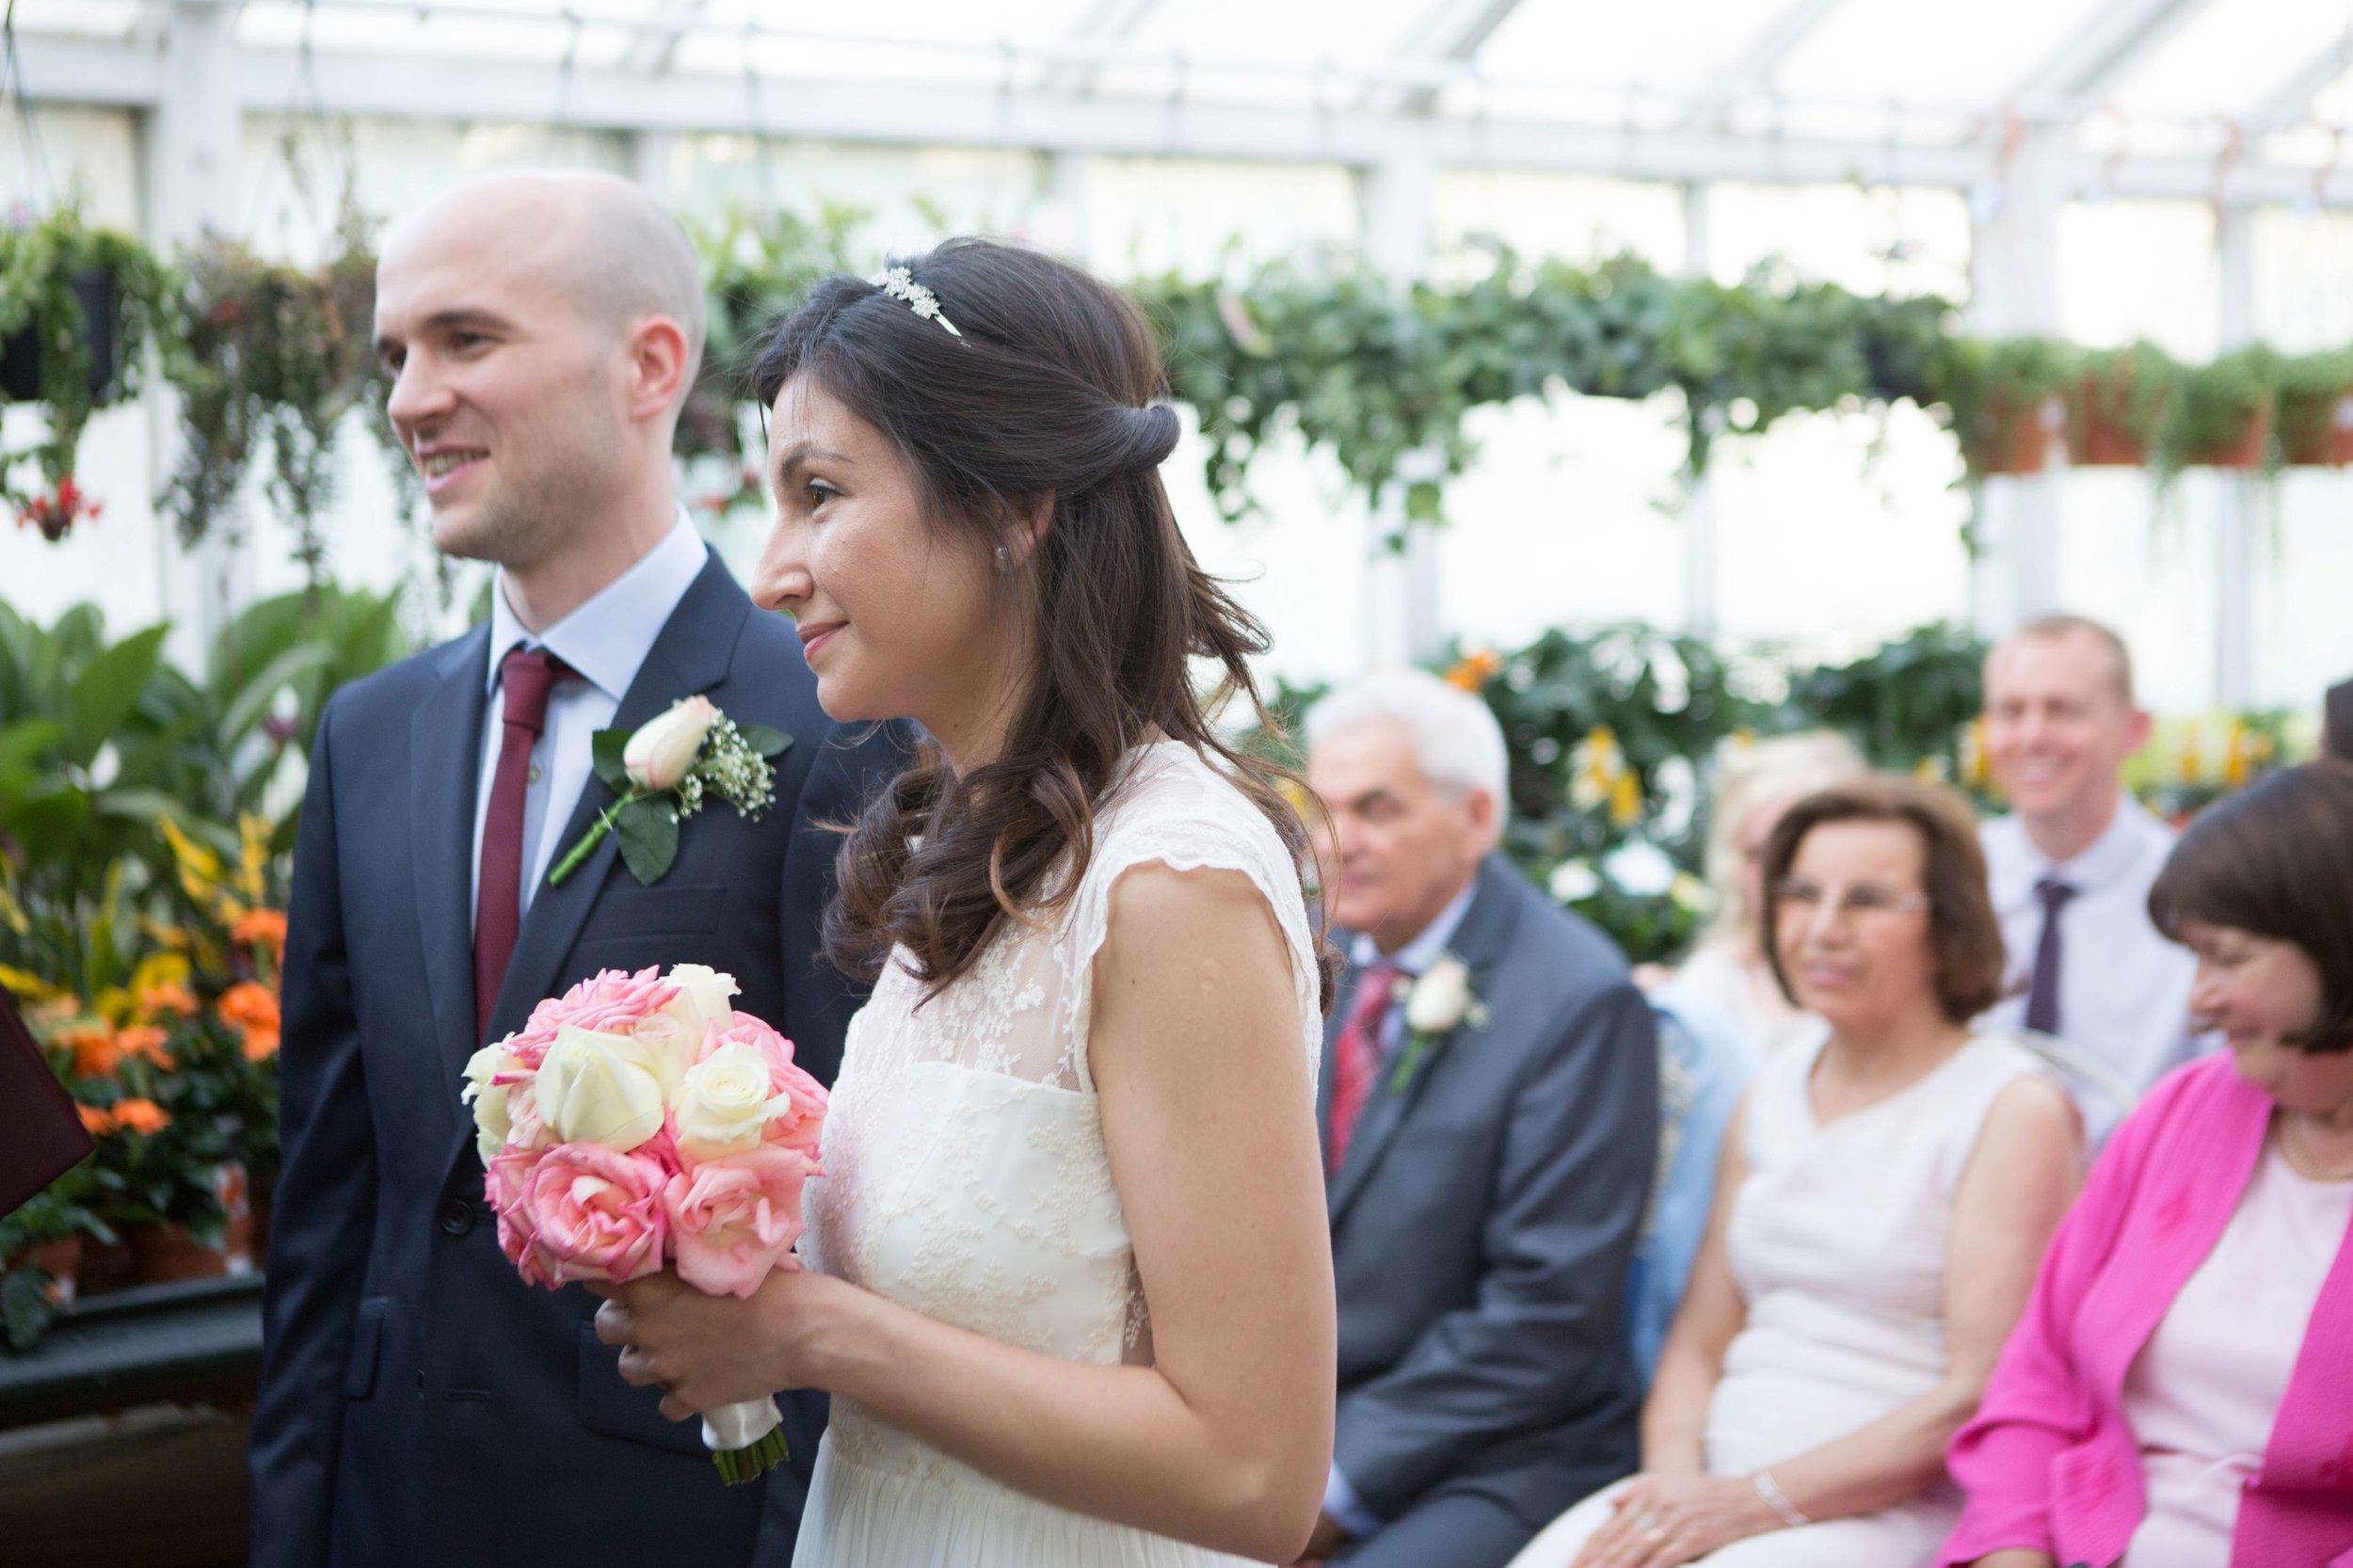 Hulya_&_Ben's_Clifton_Nurseries_London_Wedding_0238.jpg